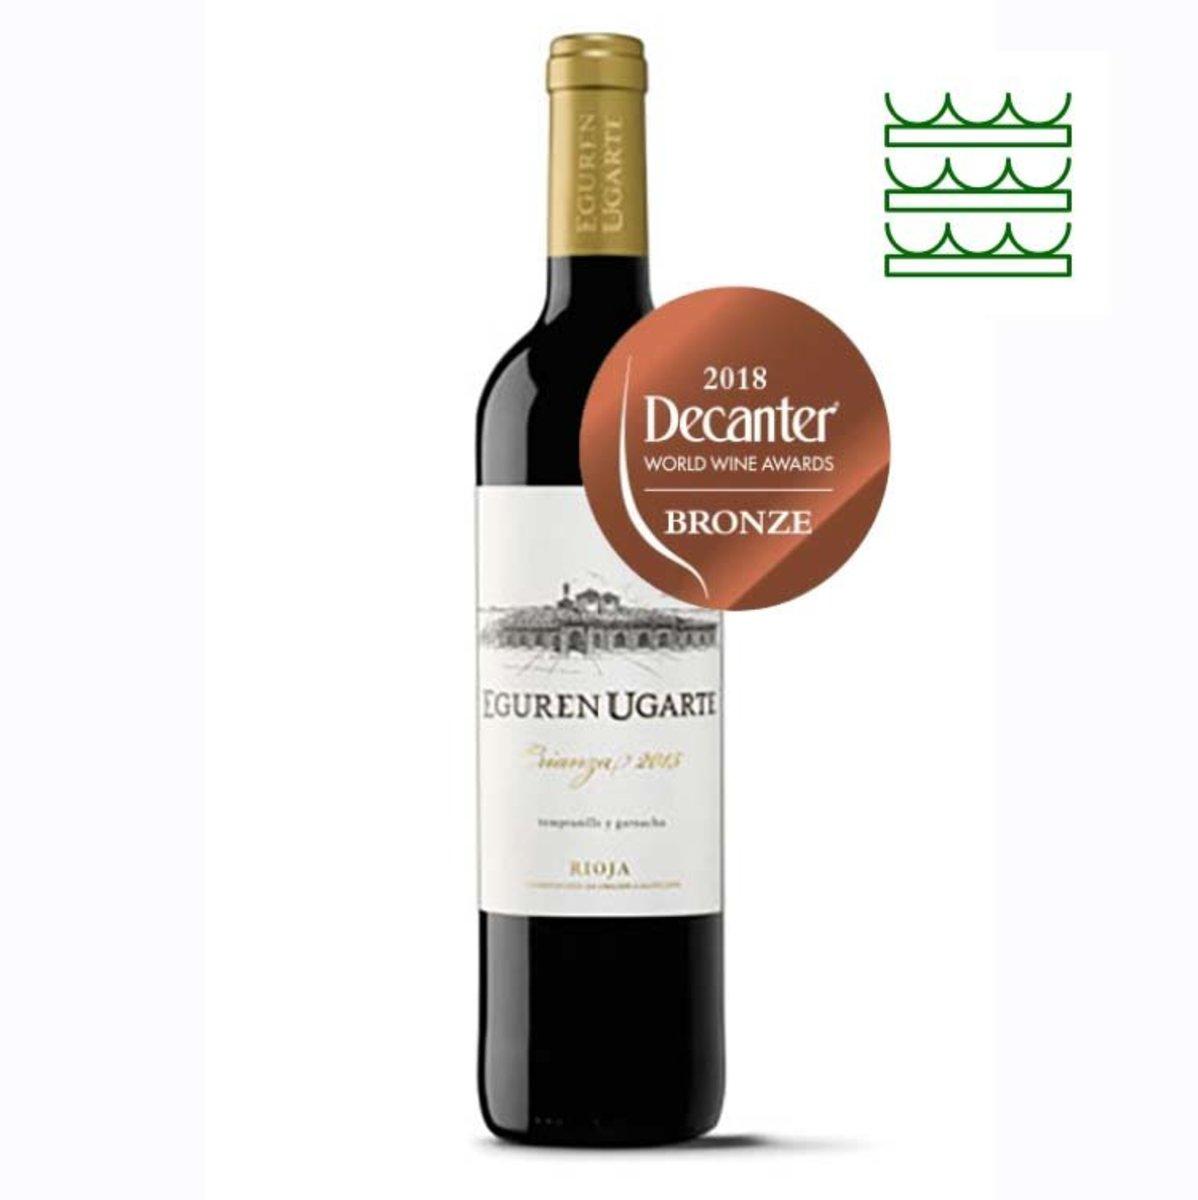 西班牙紅酒里奧哈 Crianza 2015 (Decanter 銅獎)